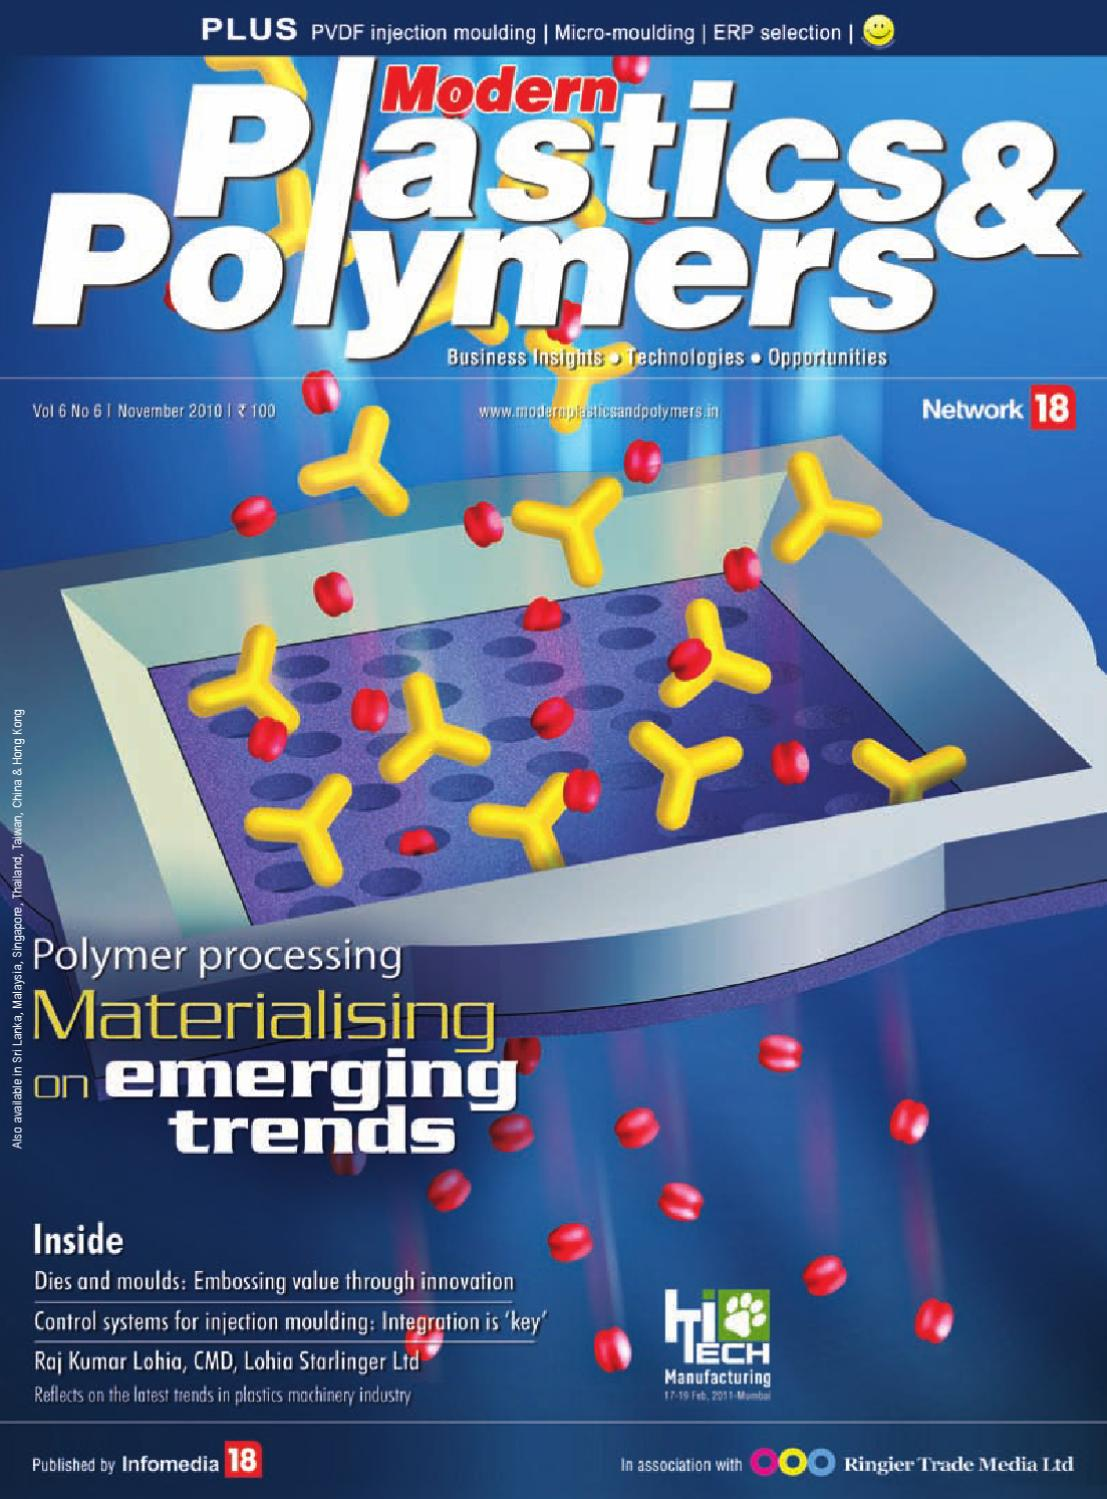 Modern Plastics & Polymers - November 2010 by Infomedia18